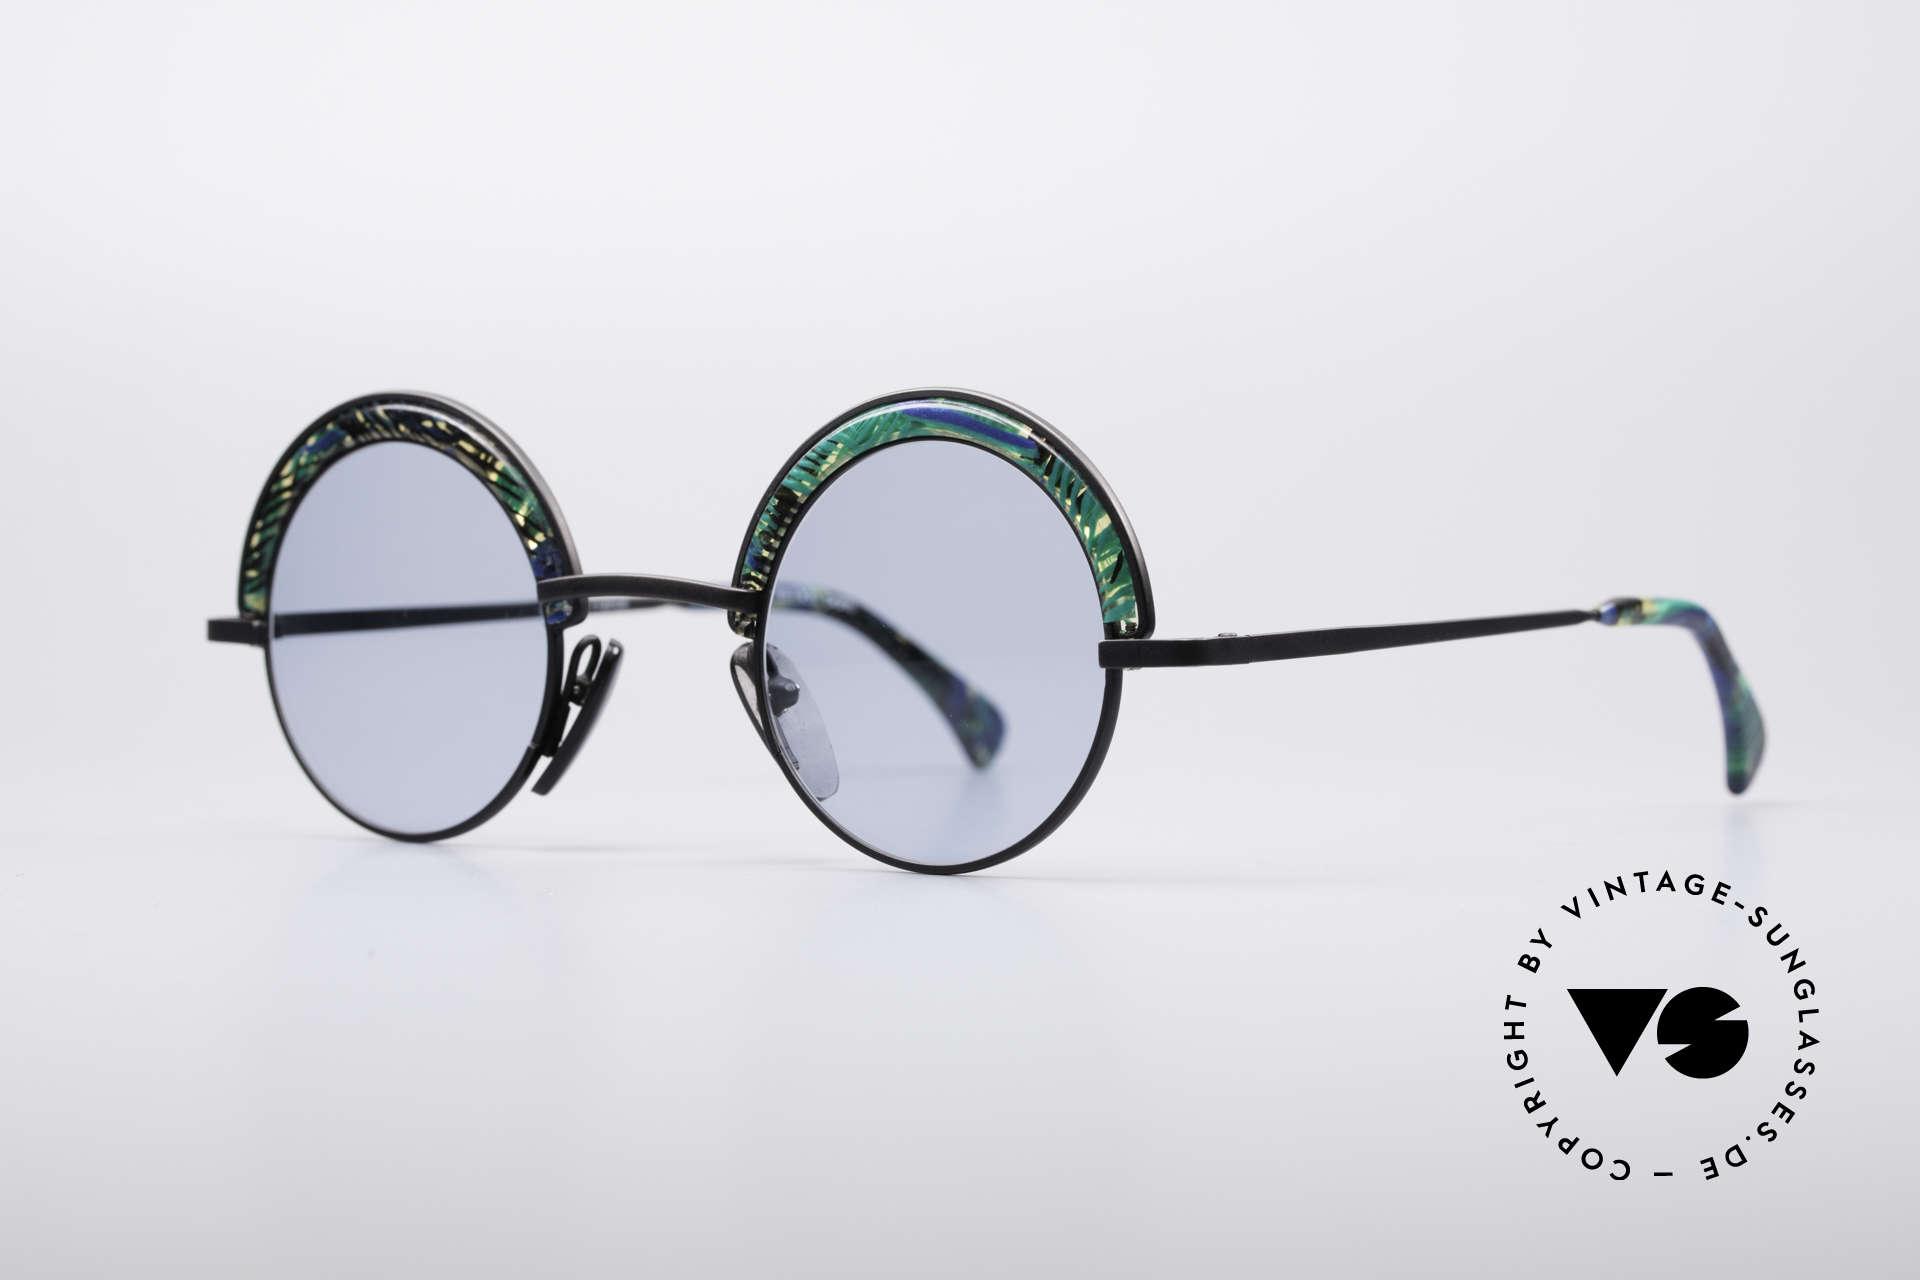 Alain Mikli 631 / 391 Round Designer Shades, premium craftsmanship & unique frame coloring, Made for Men and Women